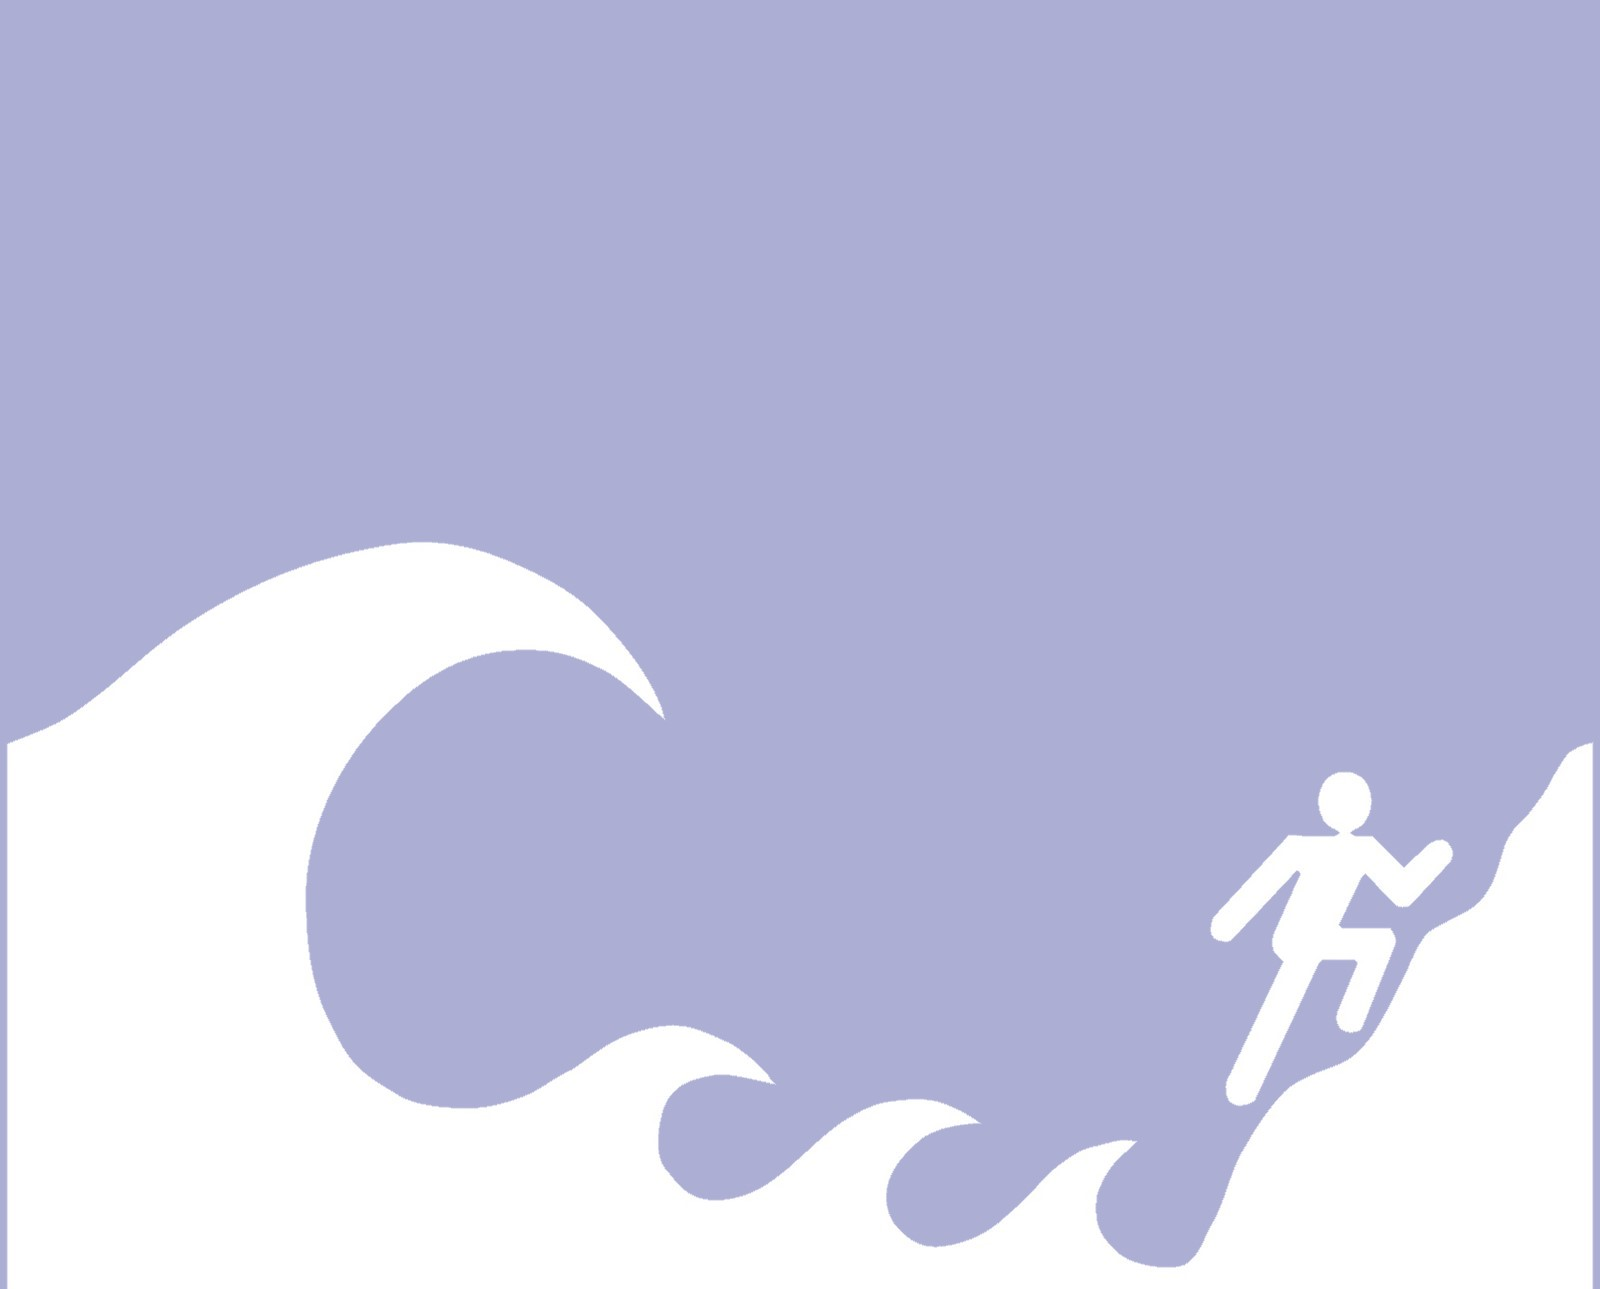 tsunami hazard sign blue notext washington coastal